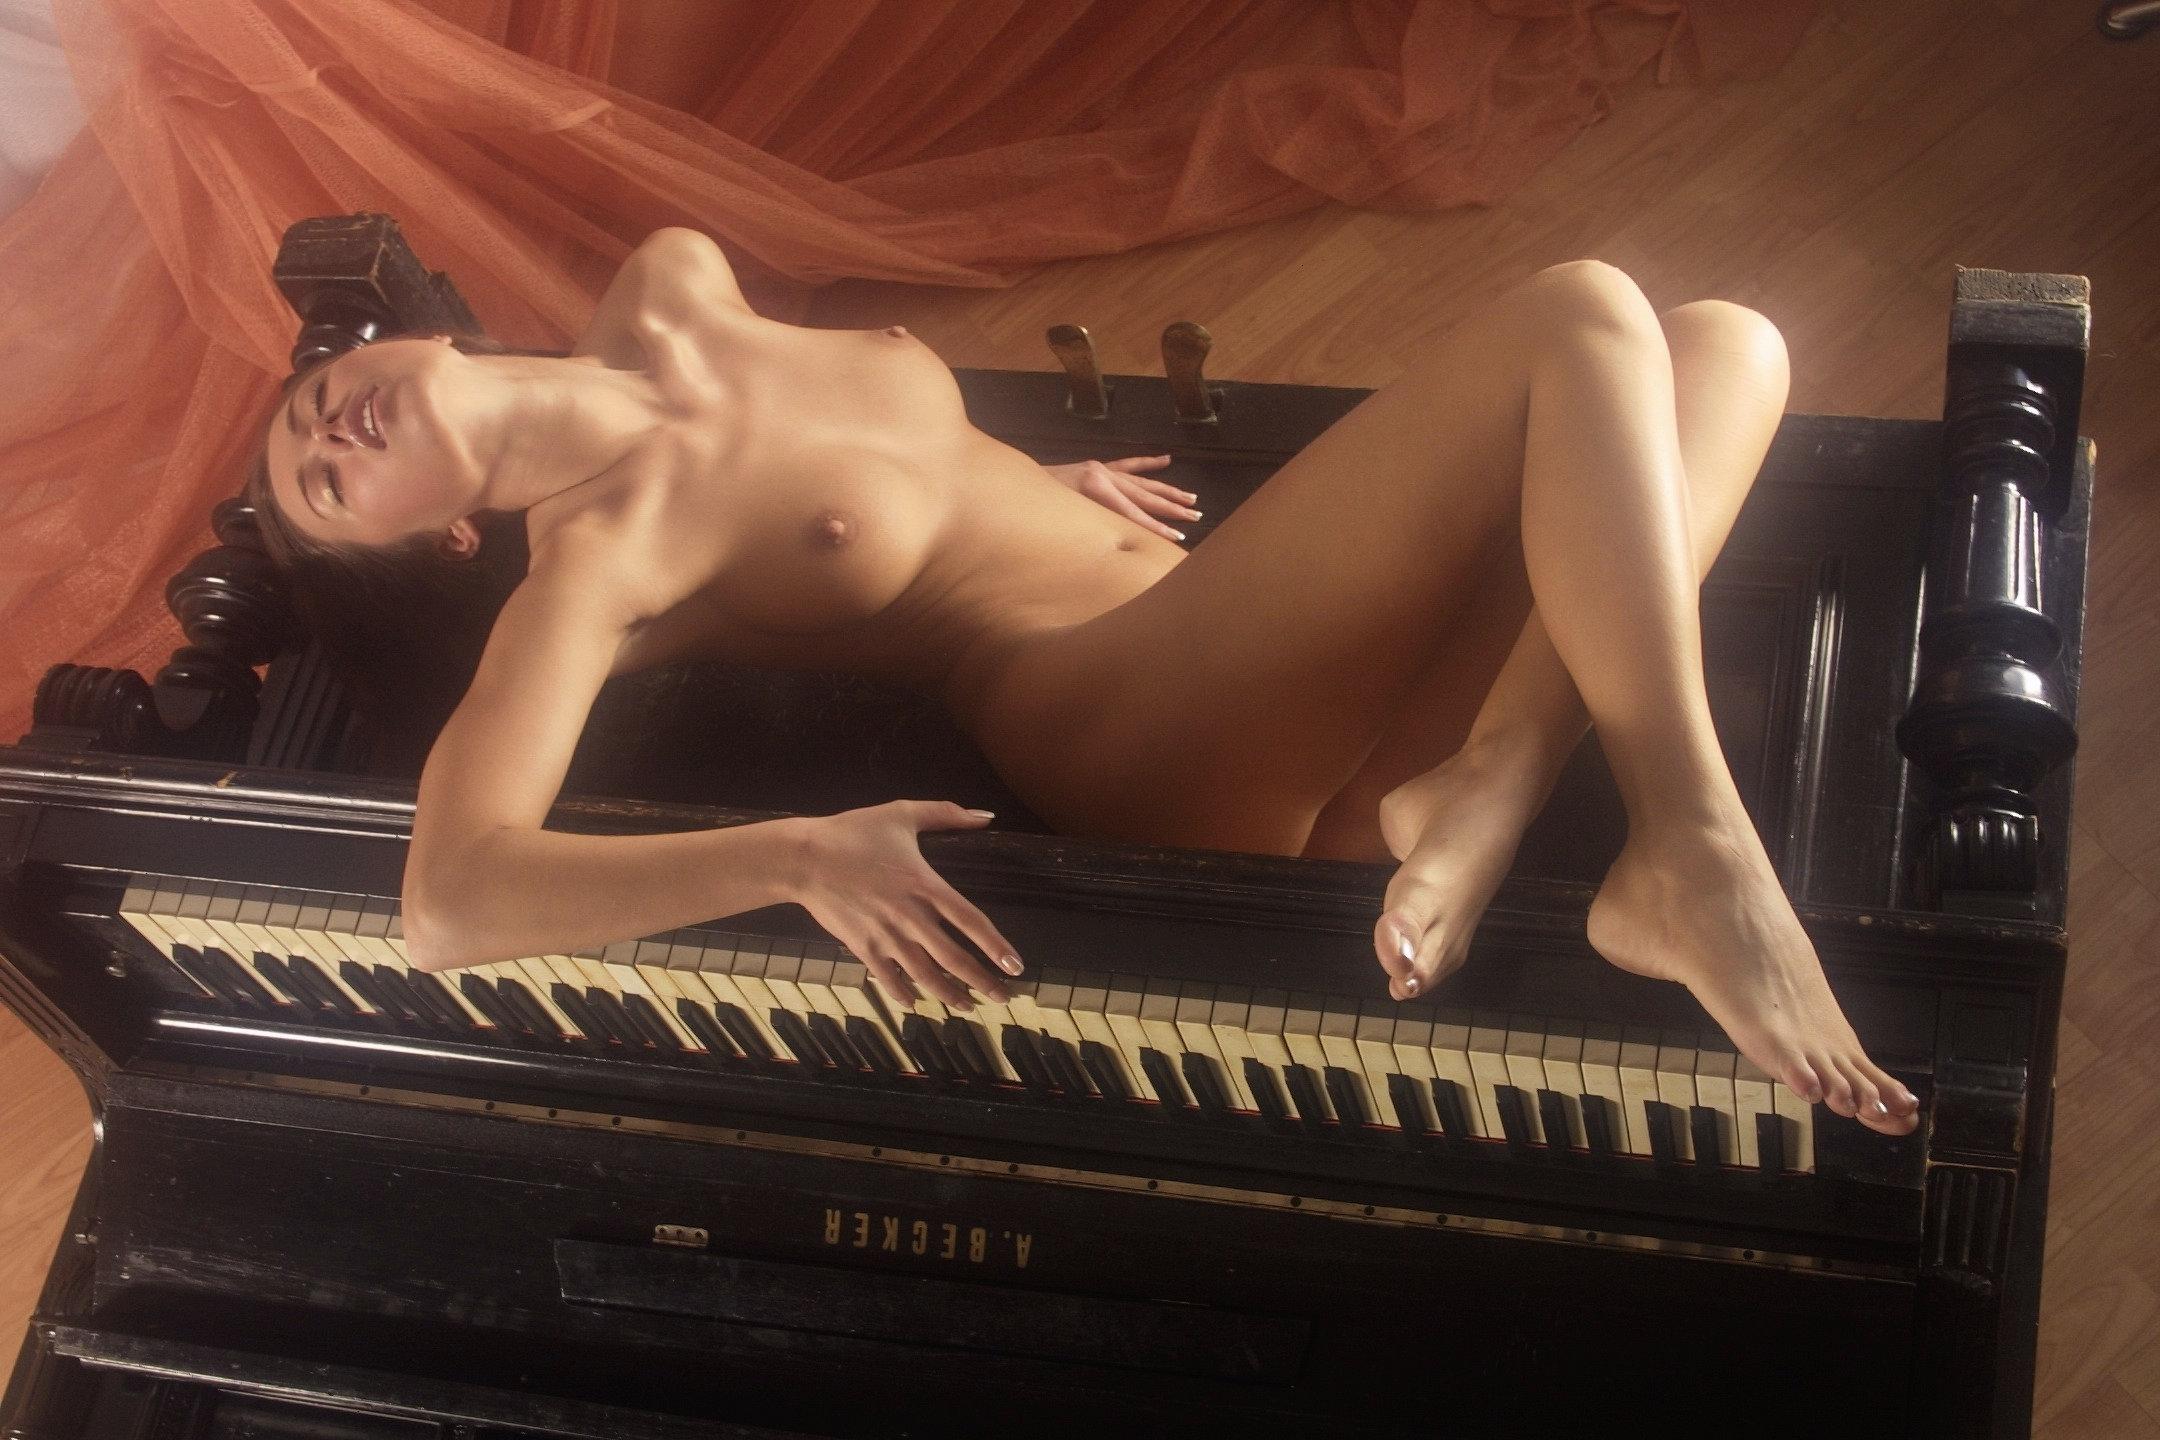 Секс на пианино картинки 8 фотография